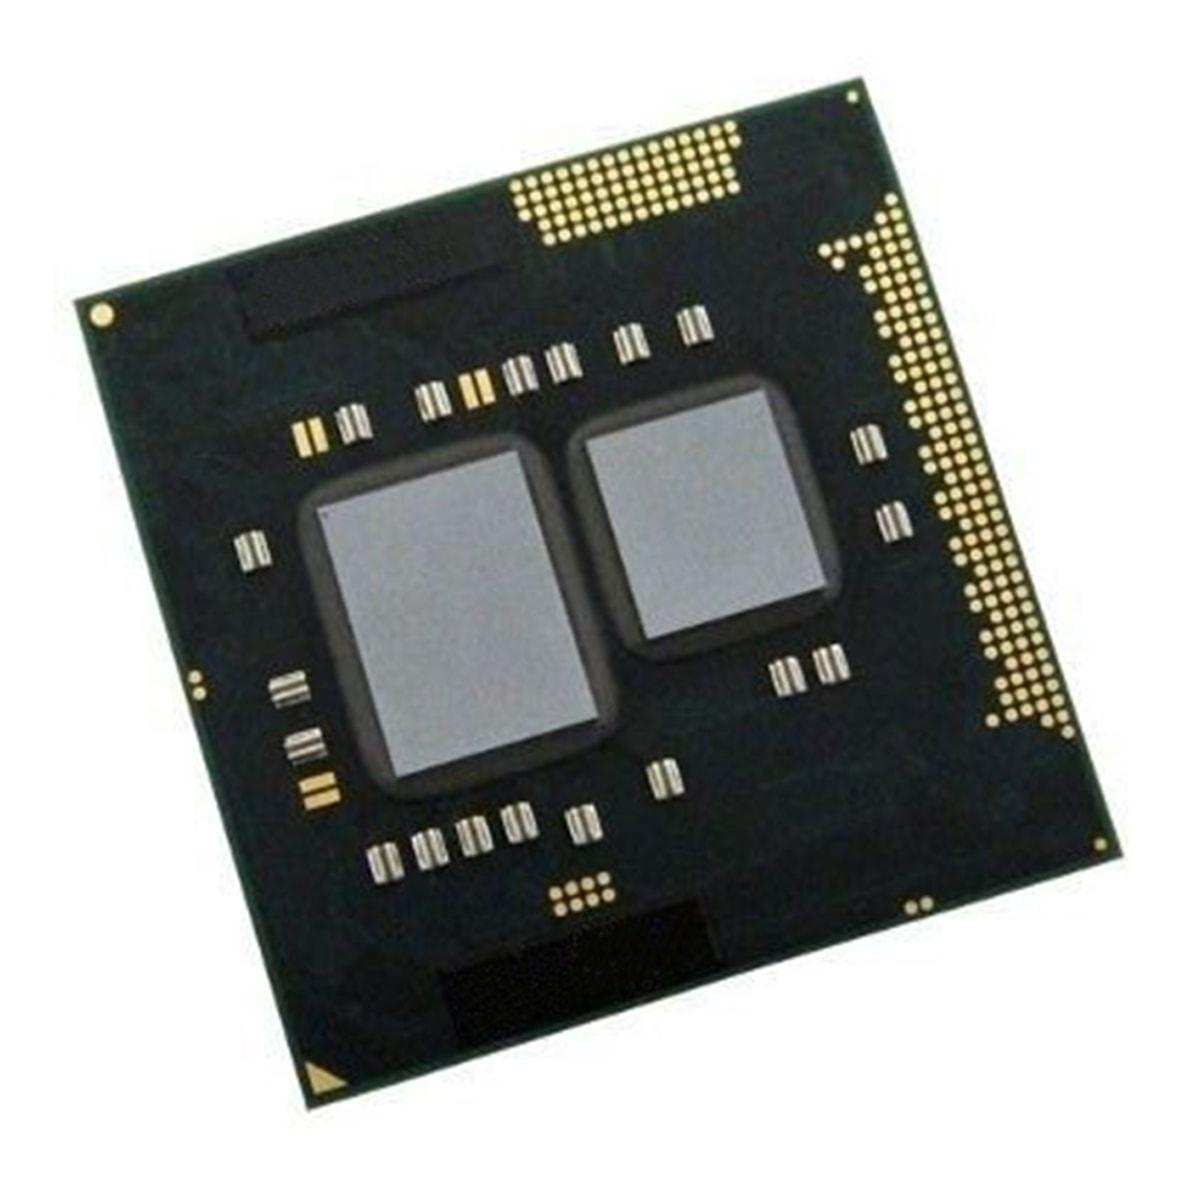 Processador Notebook Intel B960 2M Cache / 2.20 GHZ / 5 GT/s DMI - Seminovo